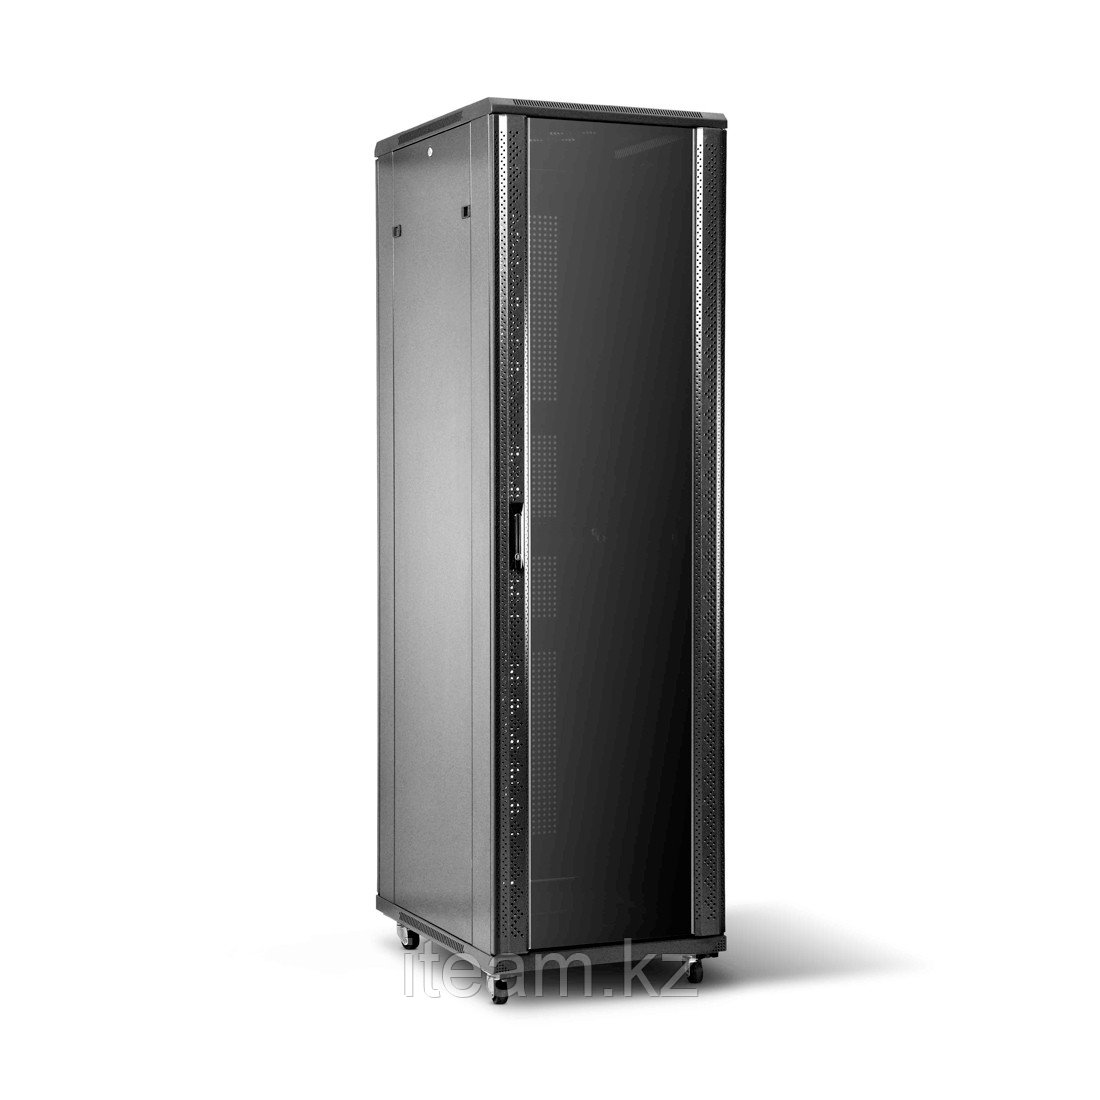 Шкаф серверный SHIP 601S.6047.24.100 47U, 600*1000*2200 мм